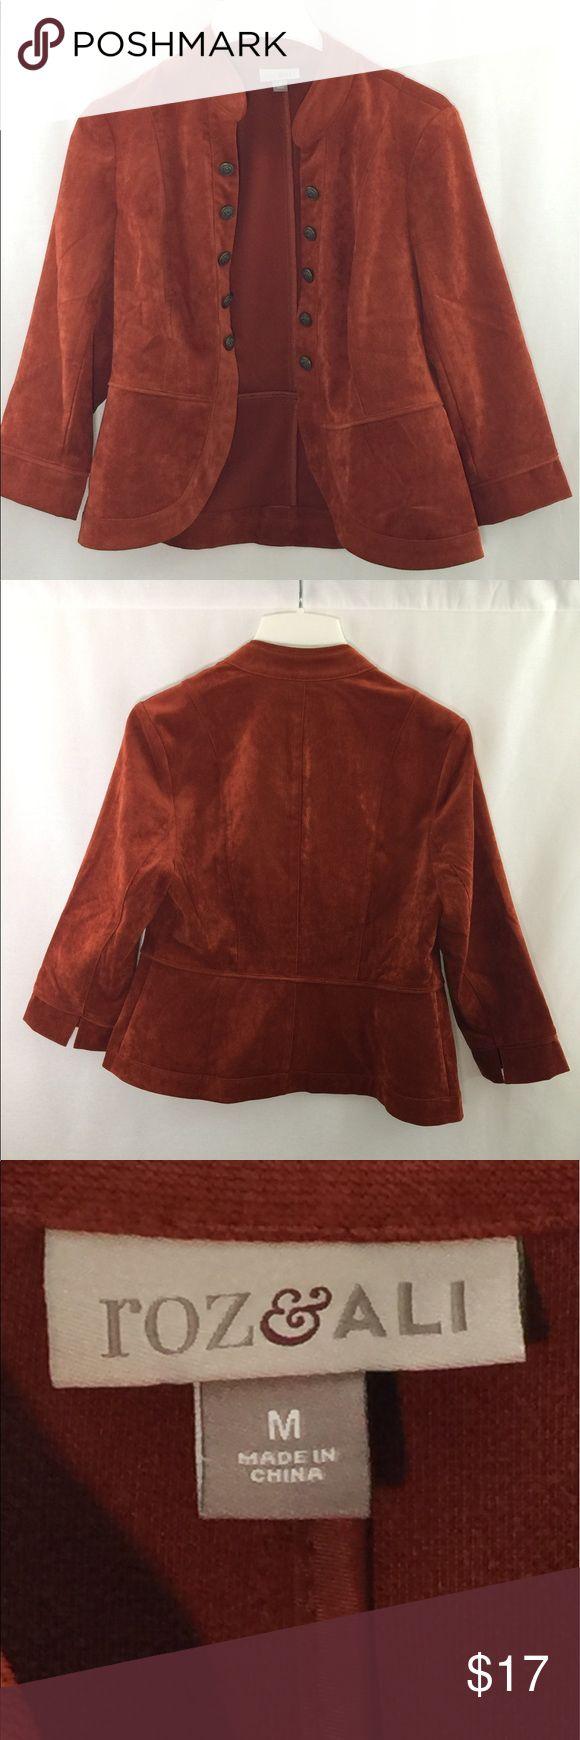 Roz & Ali blazer Roz & Ali burnt orange blazer . Great condition . comfortable. Measurements include in pictures Roz & Ali Jackets & Coats Blazers